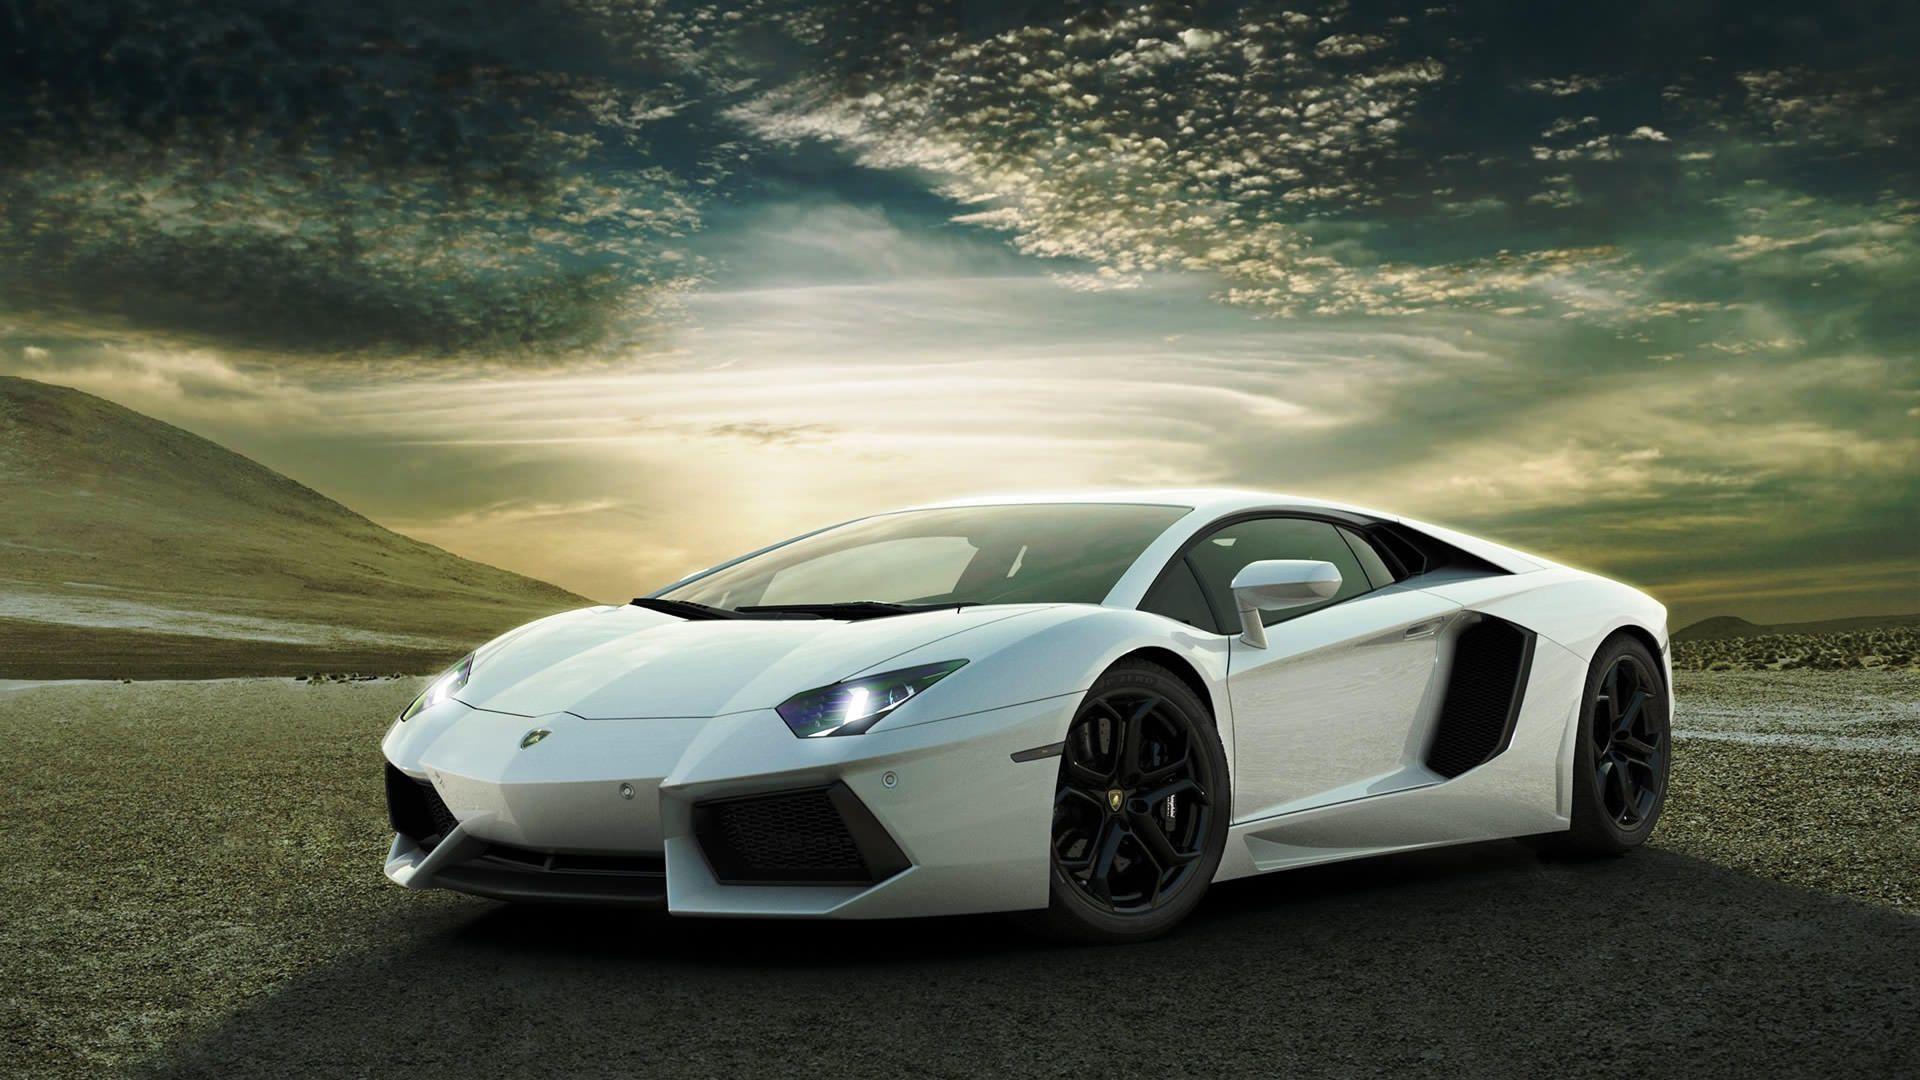 4f946e0d27548cb3d09d128feef896b4 Exciting Lamborghini Huracán Lp 610-4 Cena Cars Trend